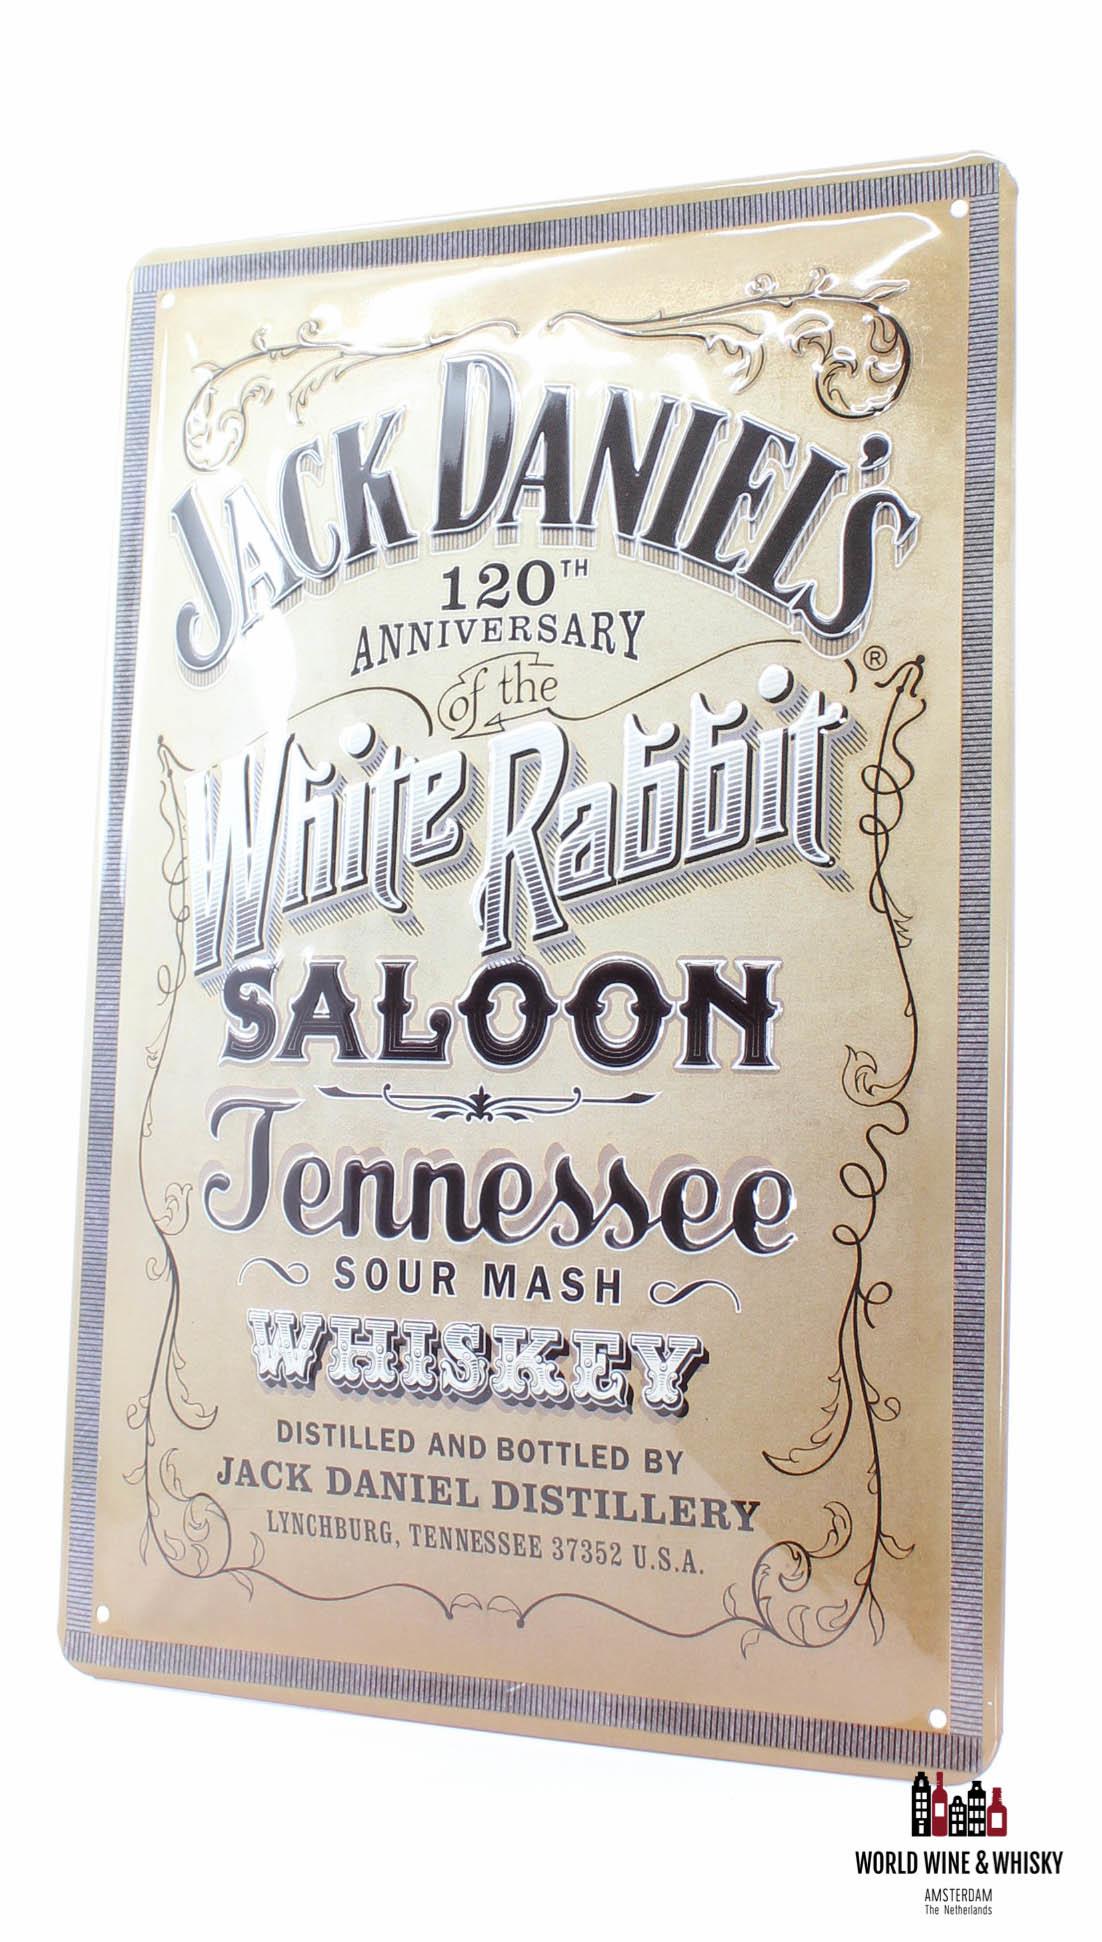 Jack Daniel's Iron Jack Daniel's Billboard Plate Sign - 120th Anniversary - White Rabbit Saloon